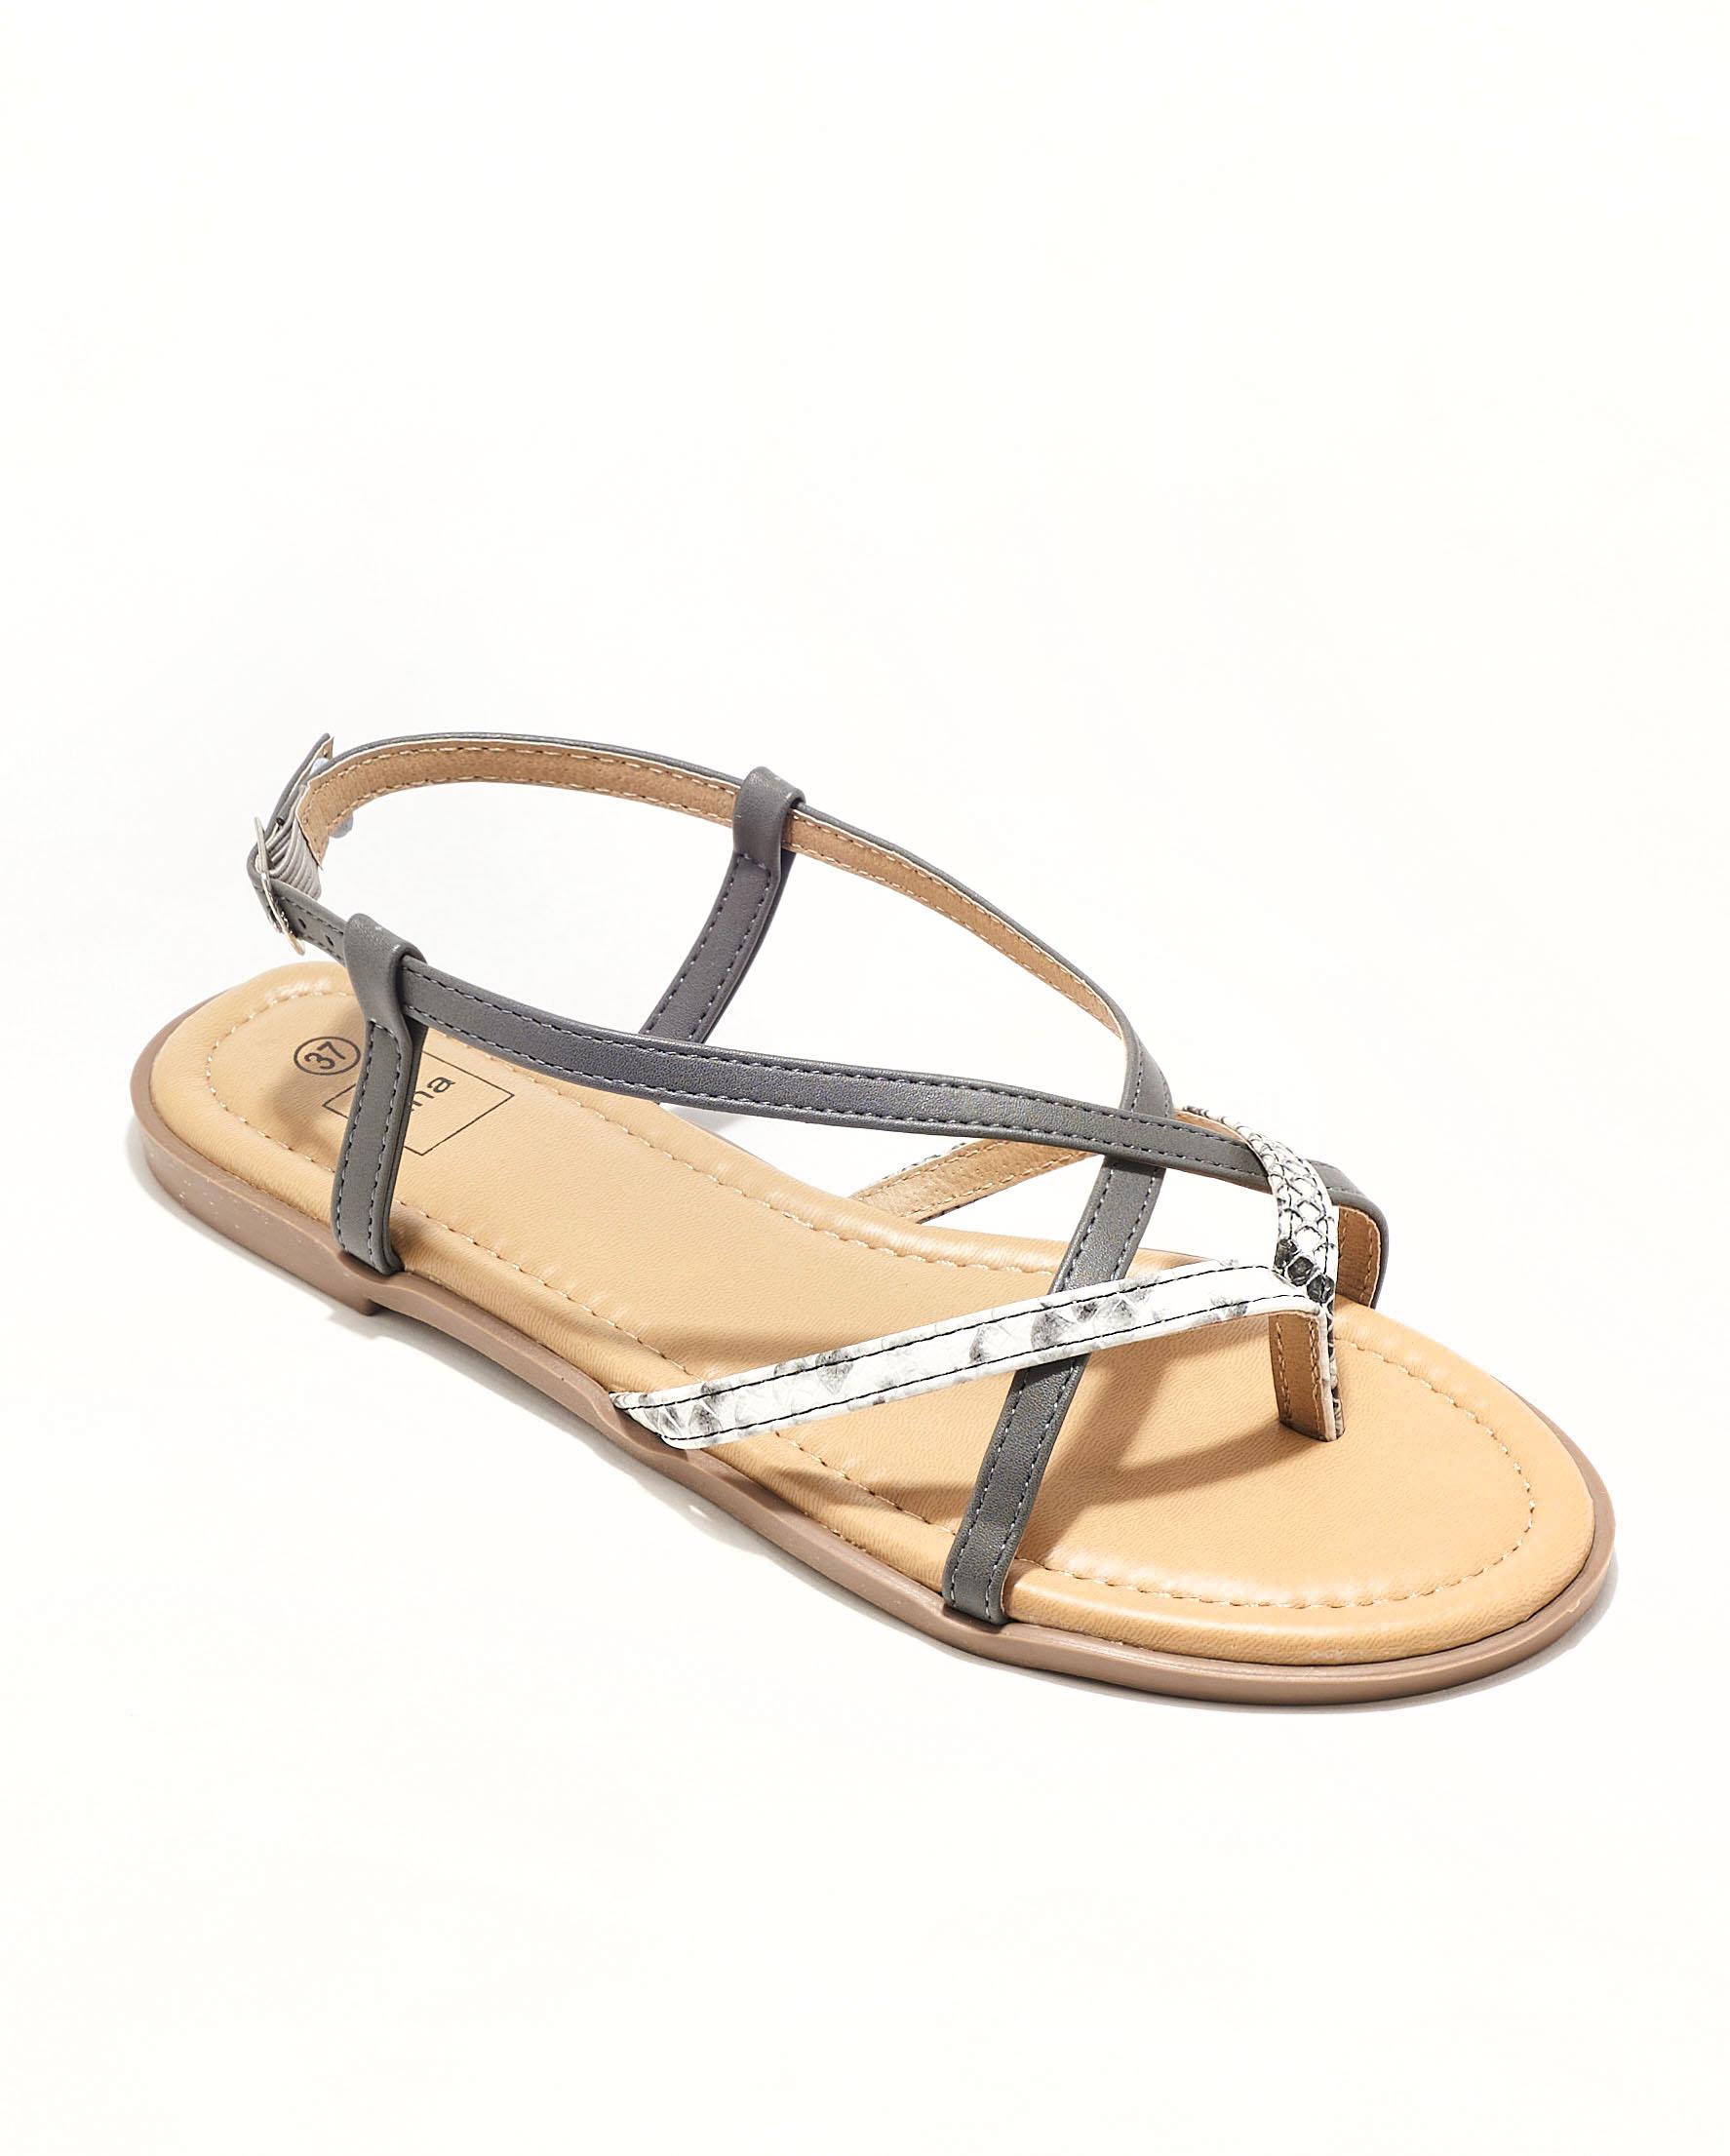 Sandales Plates Femme - Sandale Plate Python Gris Jina - Style 2 Zh P06